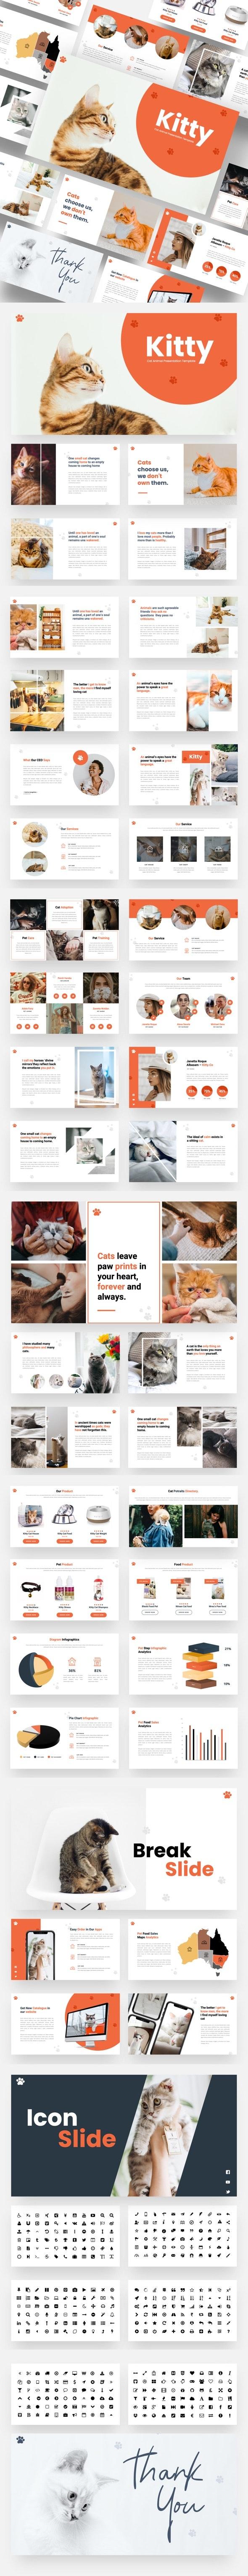 Kitty - Cat Animal Google Slides Template - Google Slides Presentation Templates